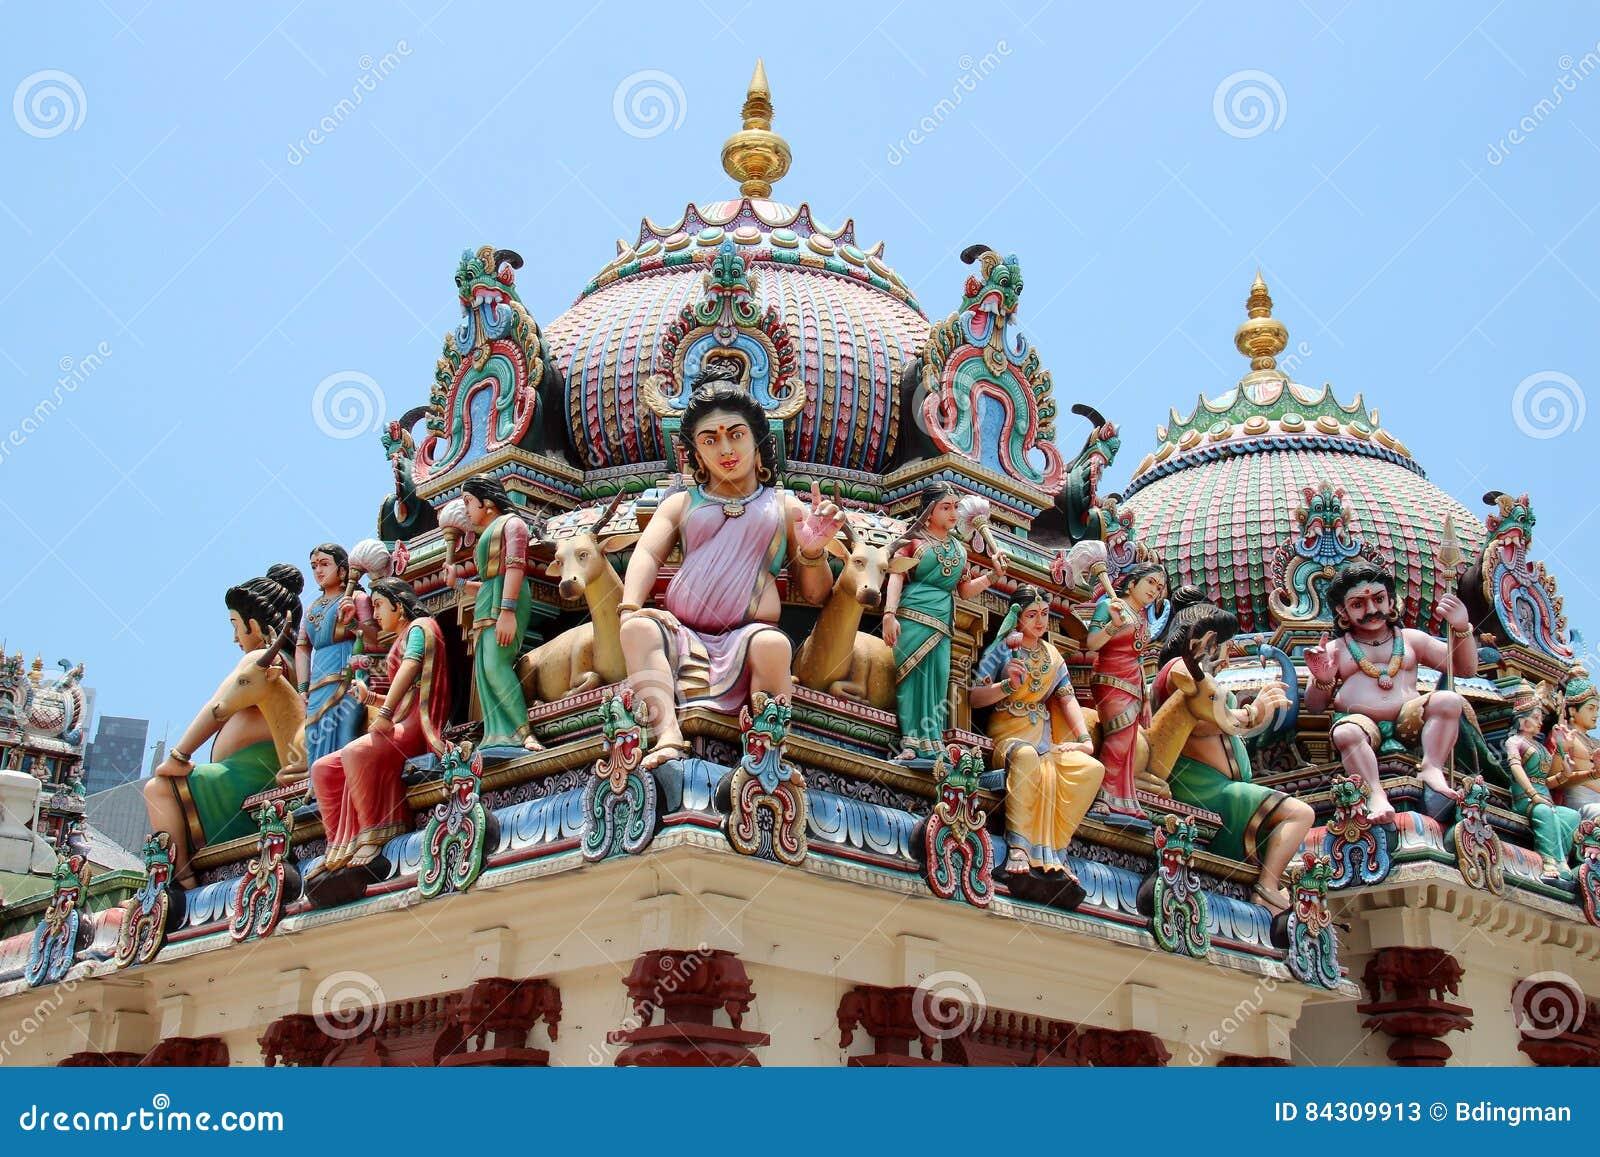 Sri Mariamman tempel - Singapore